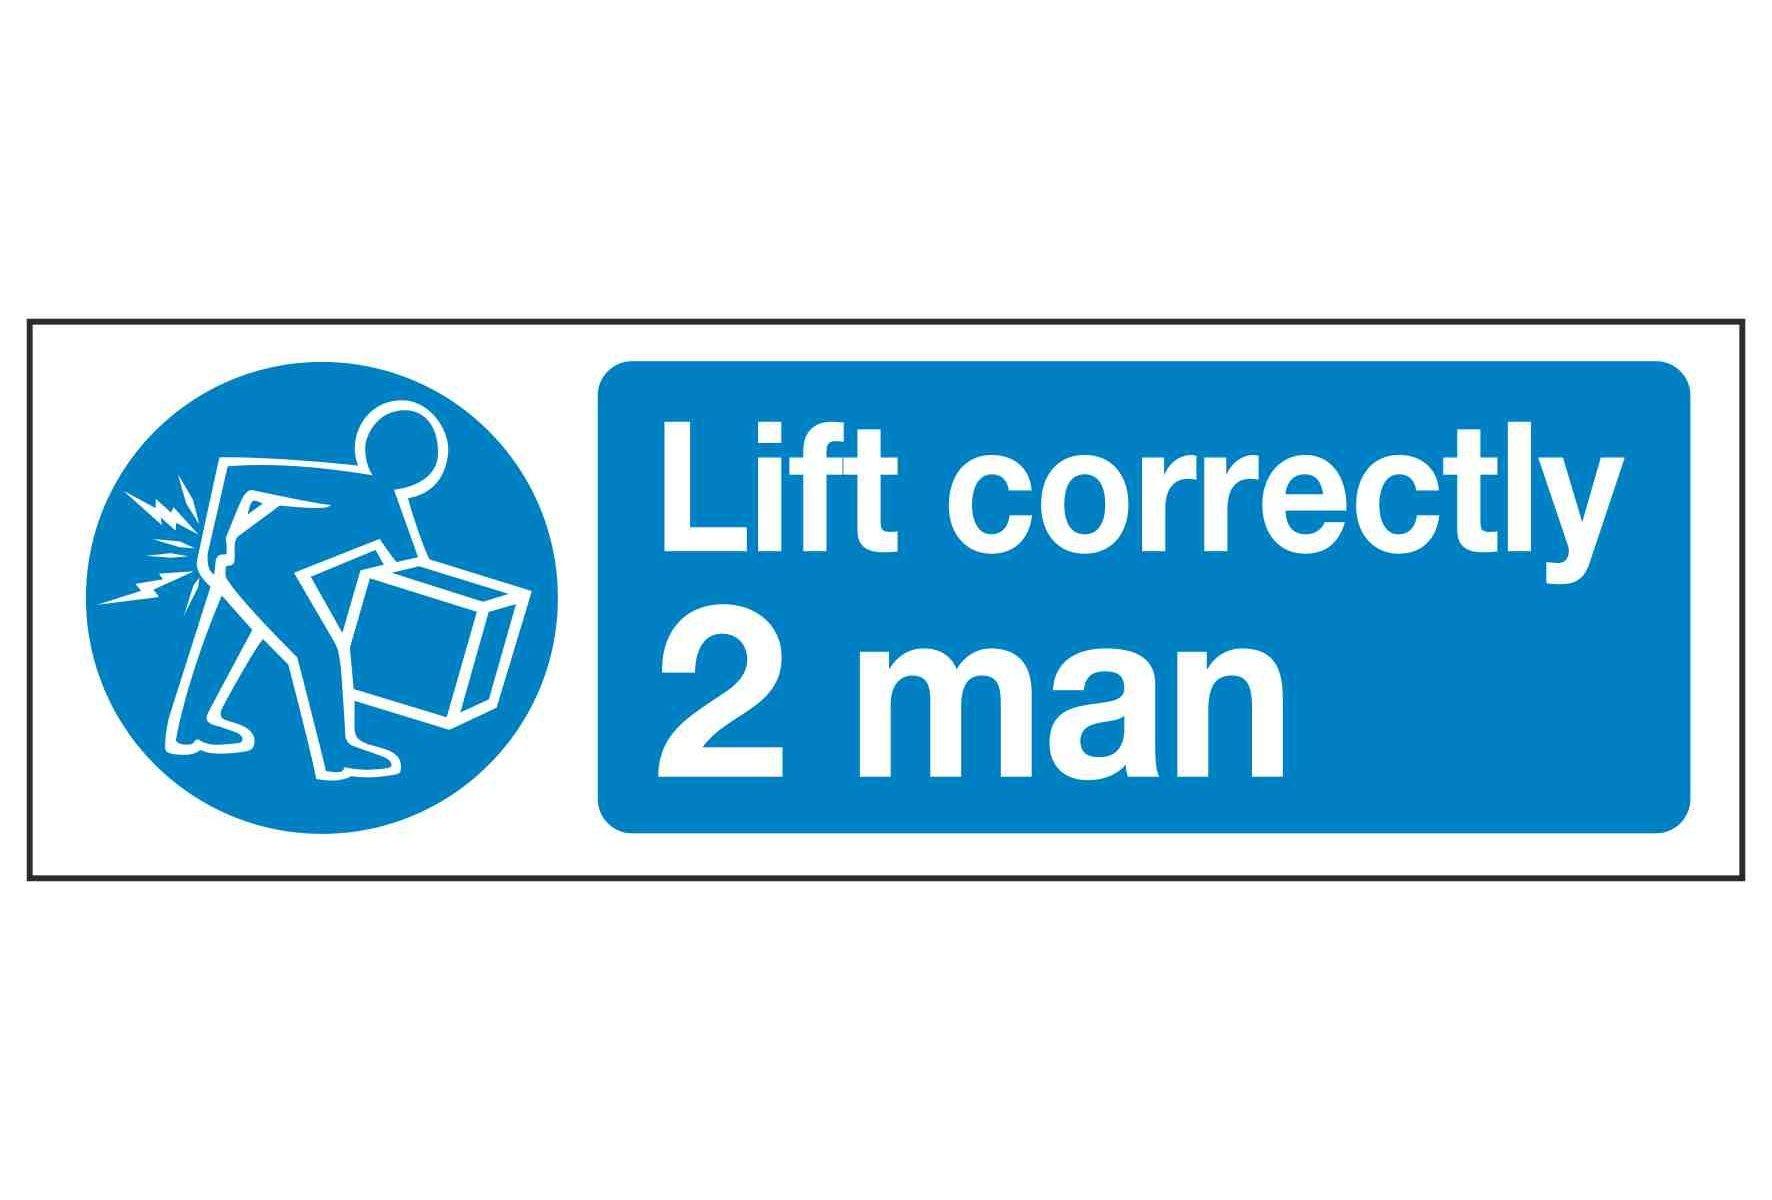 Lift correctly 2 man